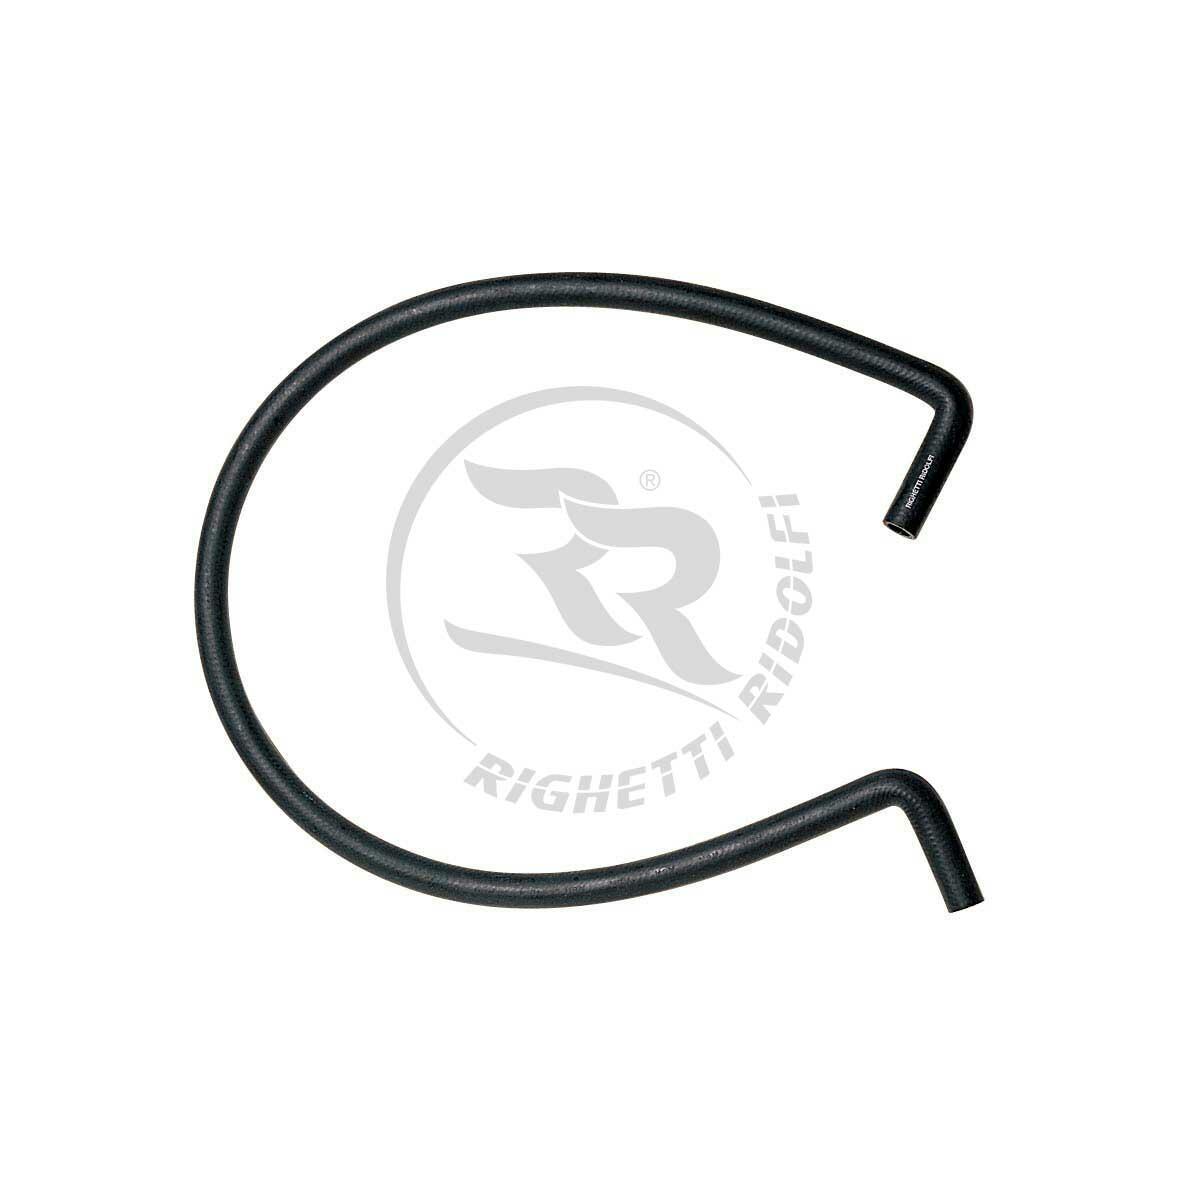 RUBBER PIPE 90° - LENGTH 1200mm - BLACK COLOUR